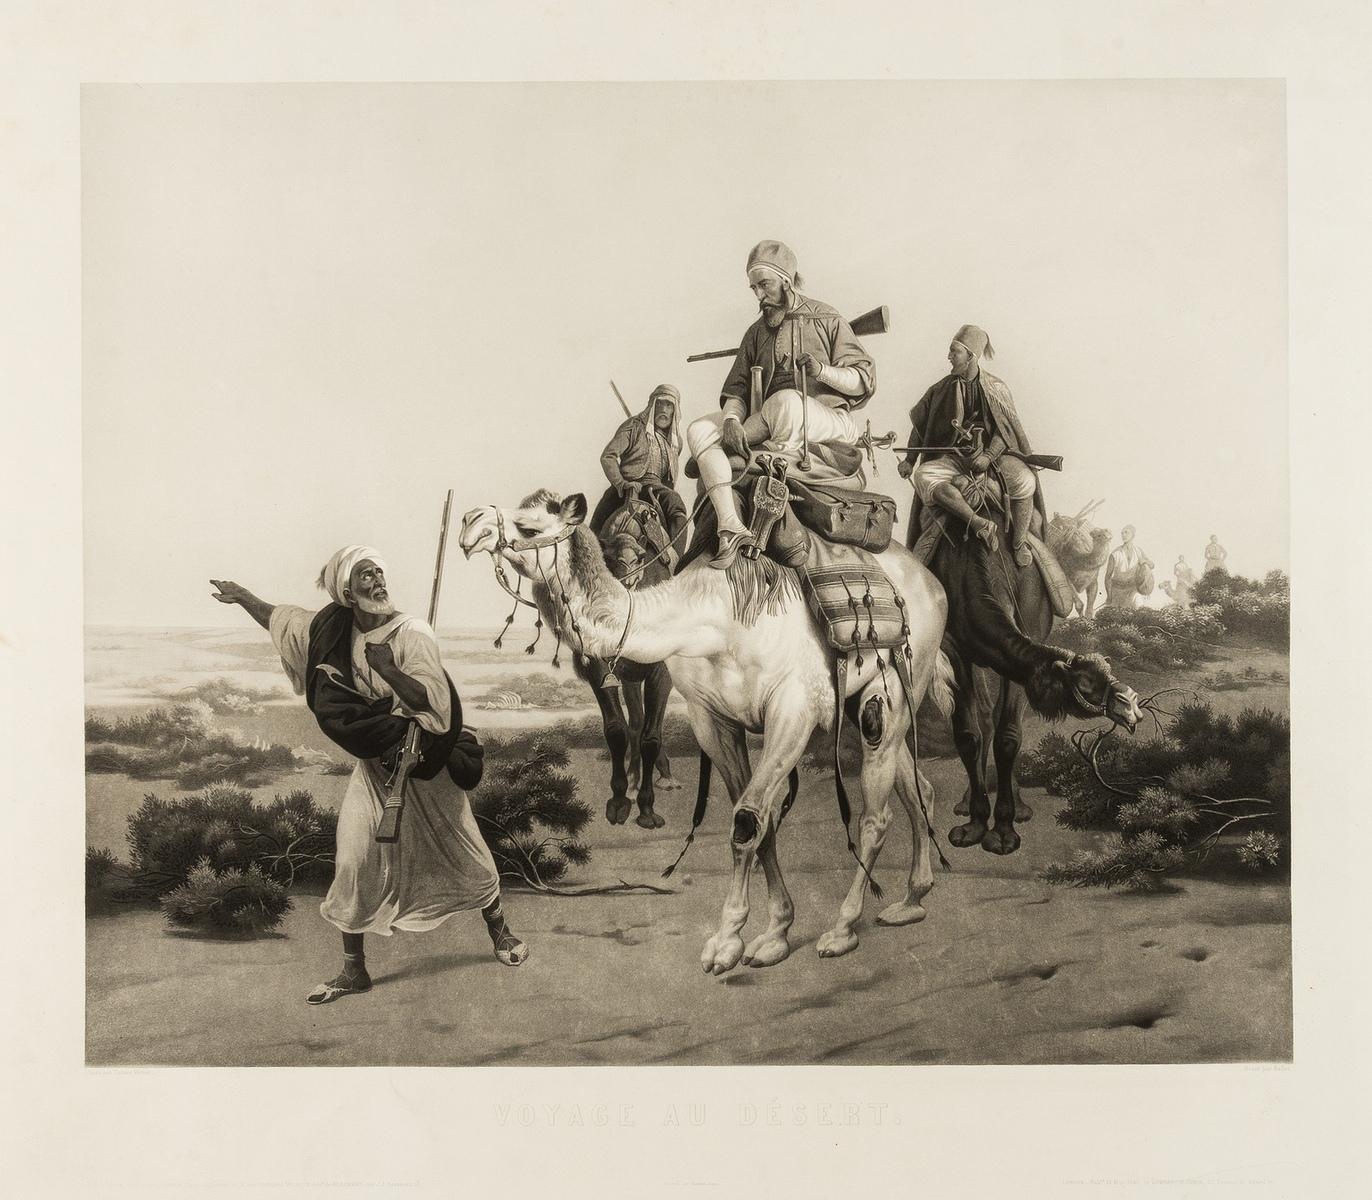 Middle East.- Vernet (Emile-Jean-Horace), After. Voyage au Désert, engraving, 1846.